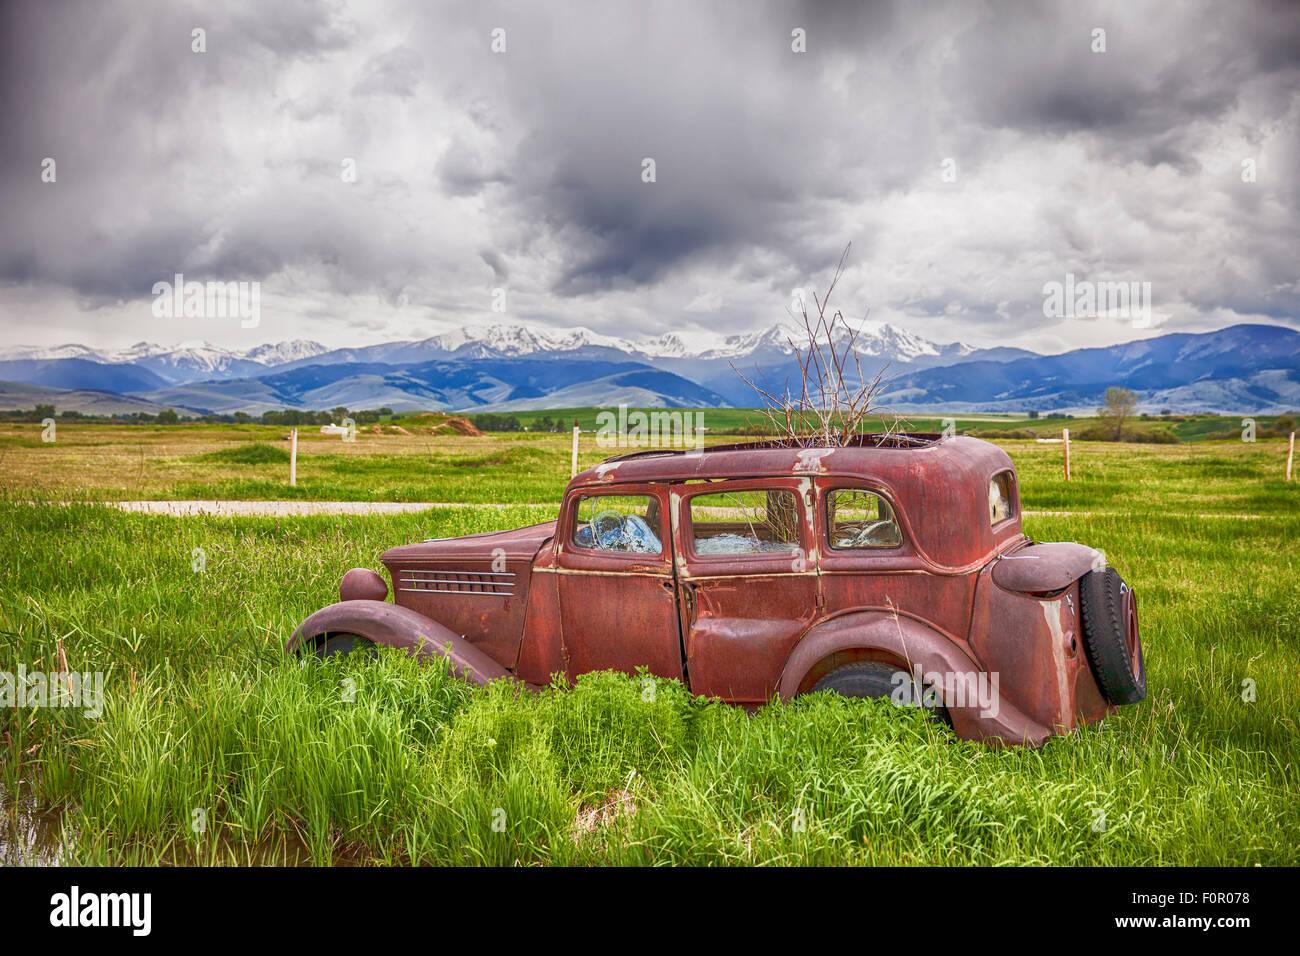 La oxidación Jalopy en Finca Montana Imagen De Stock